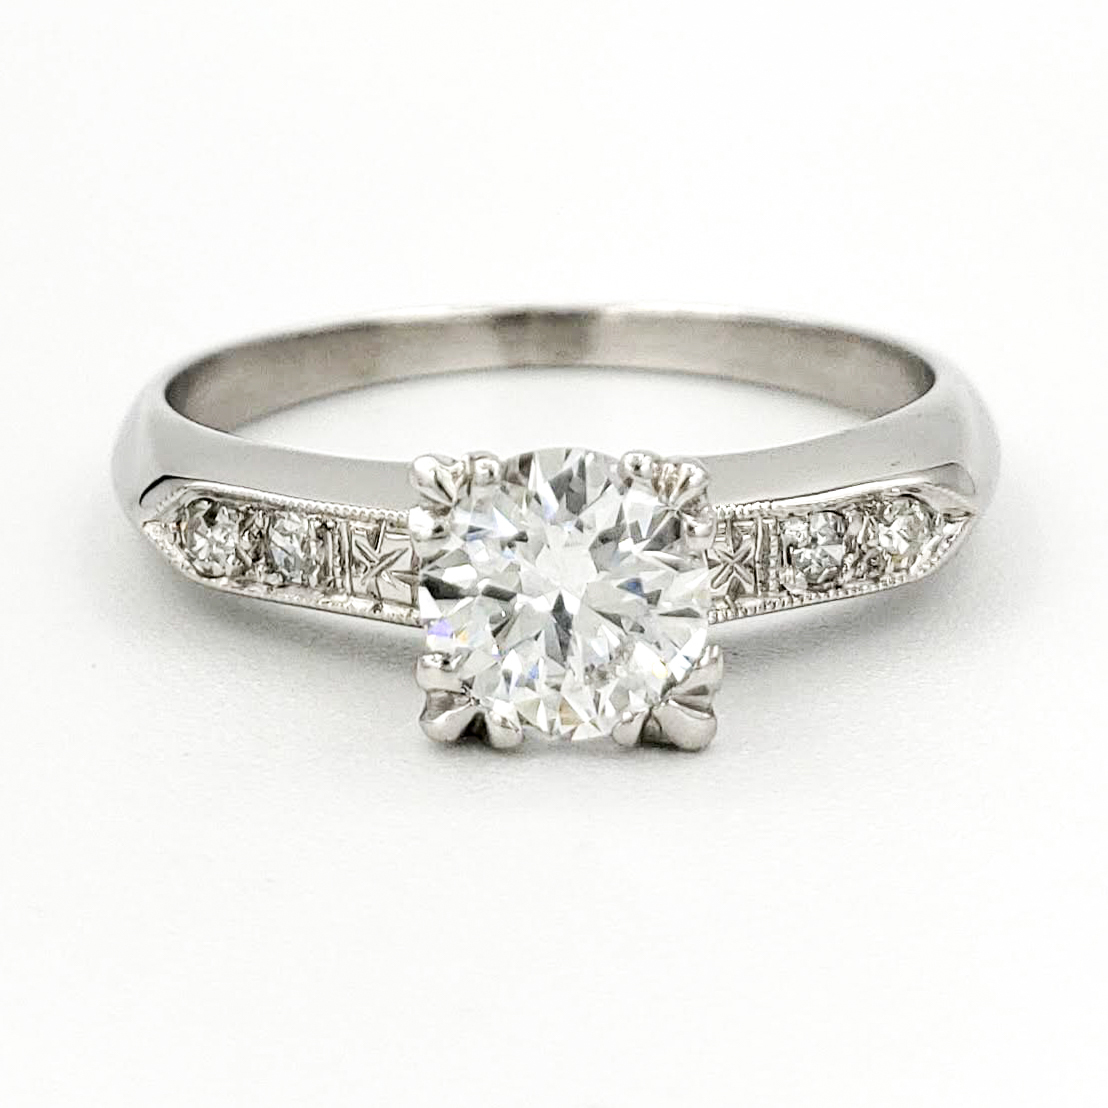 vintage-platinum-engagement-ring-with-0-50-carat-transitional-cut-diamond-egl-d-vs1